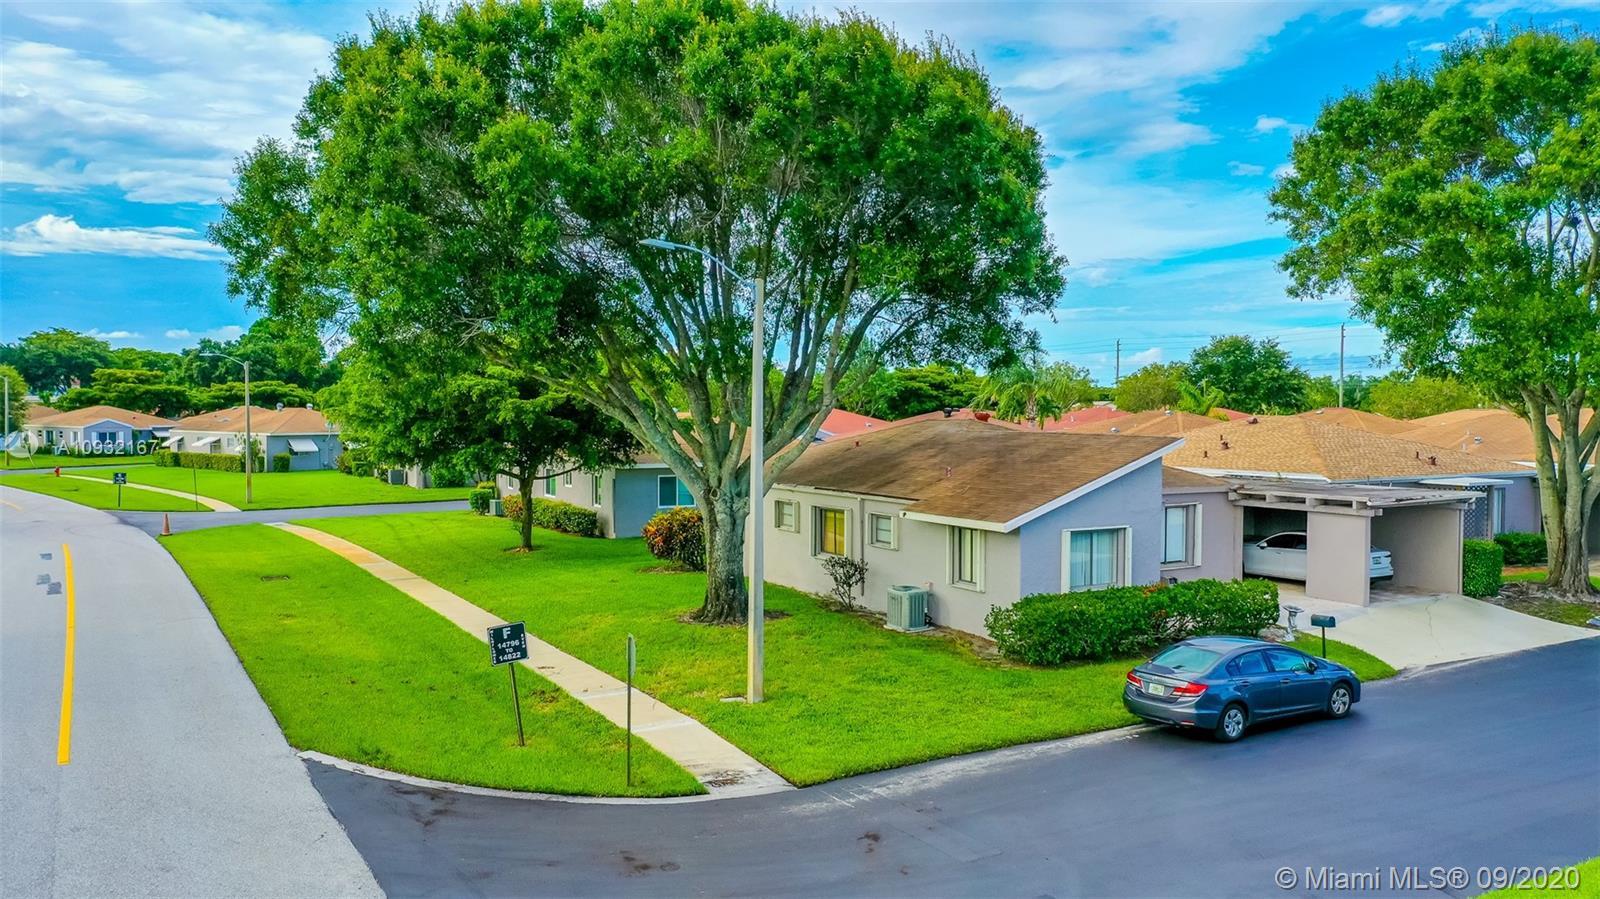 14796 Wildflower Ln, Delray Beach, Florida 33446, 3 Bedrooms Bedrooms, ,2 BathroomsBathrooms,Residential,For Sale,14796 Wildflower Ln,A10932167